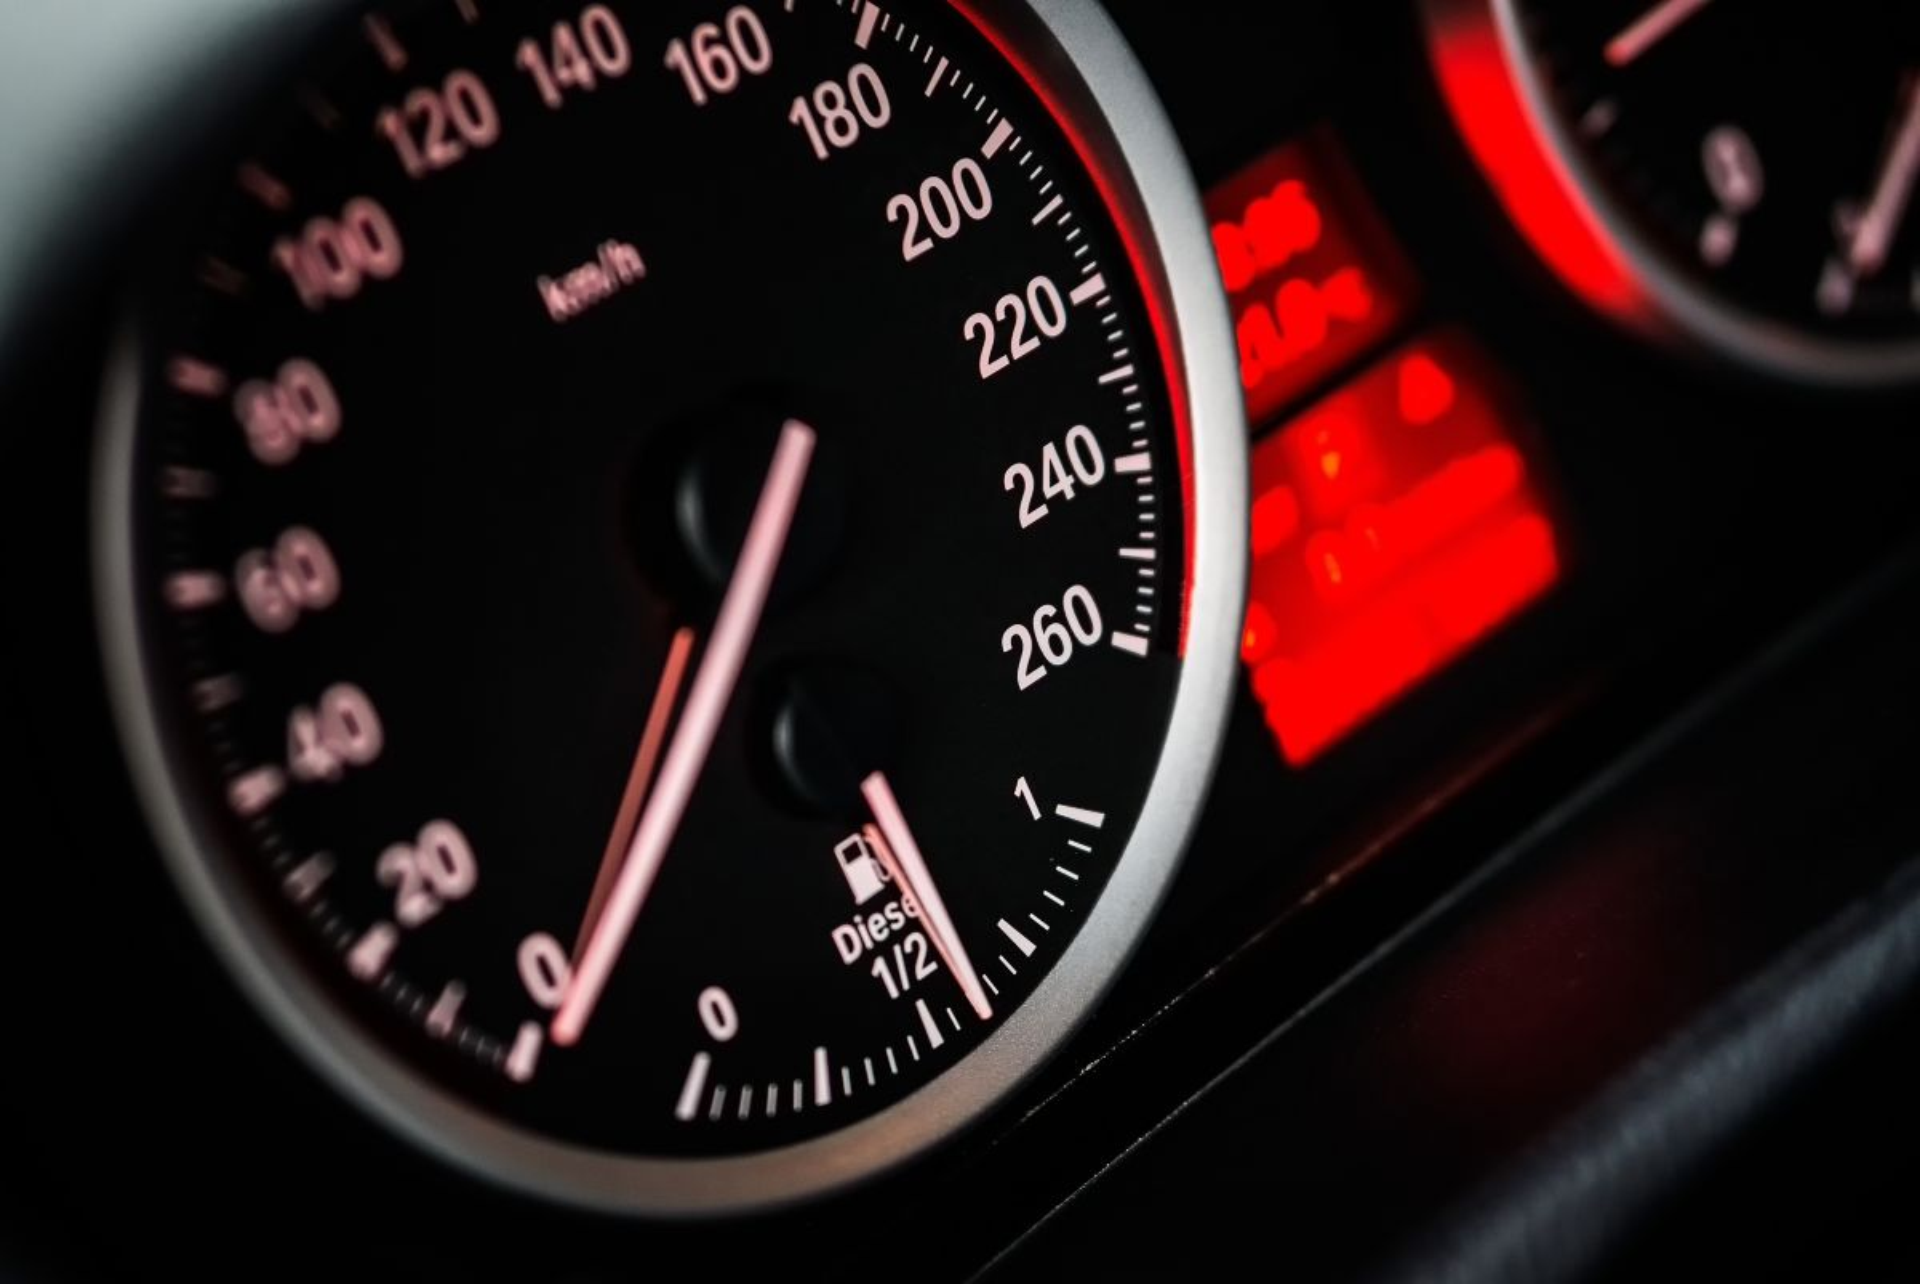 Surriscaldamento motore auto